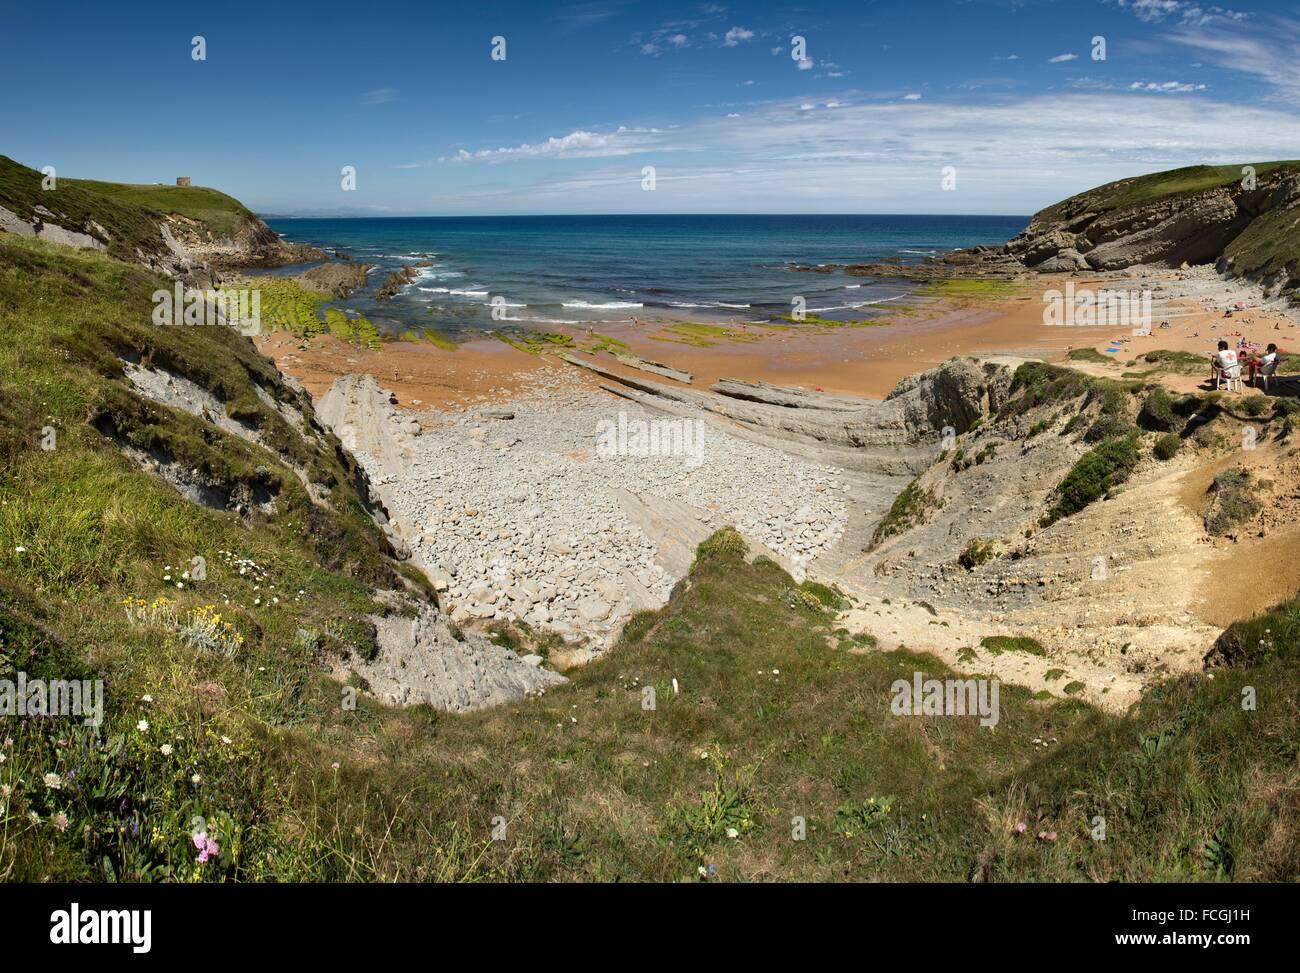 El Sable beach, Suances, Cantabria, Spain - Stock Image